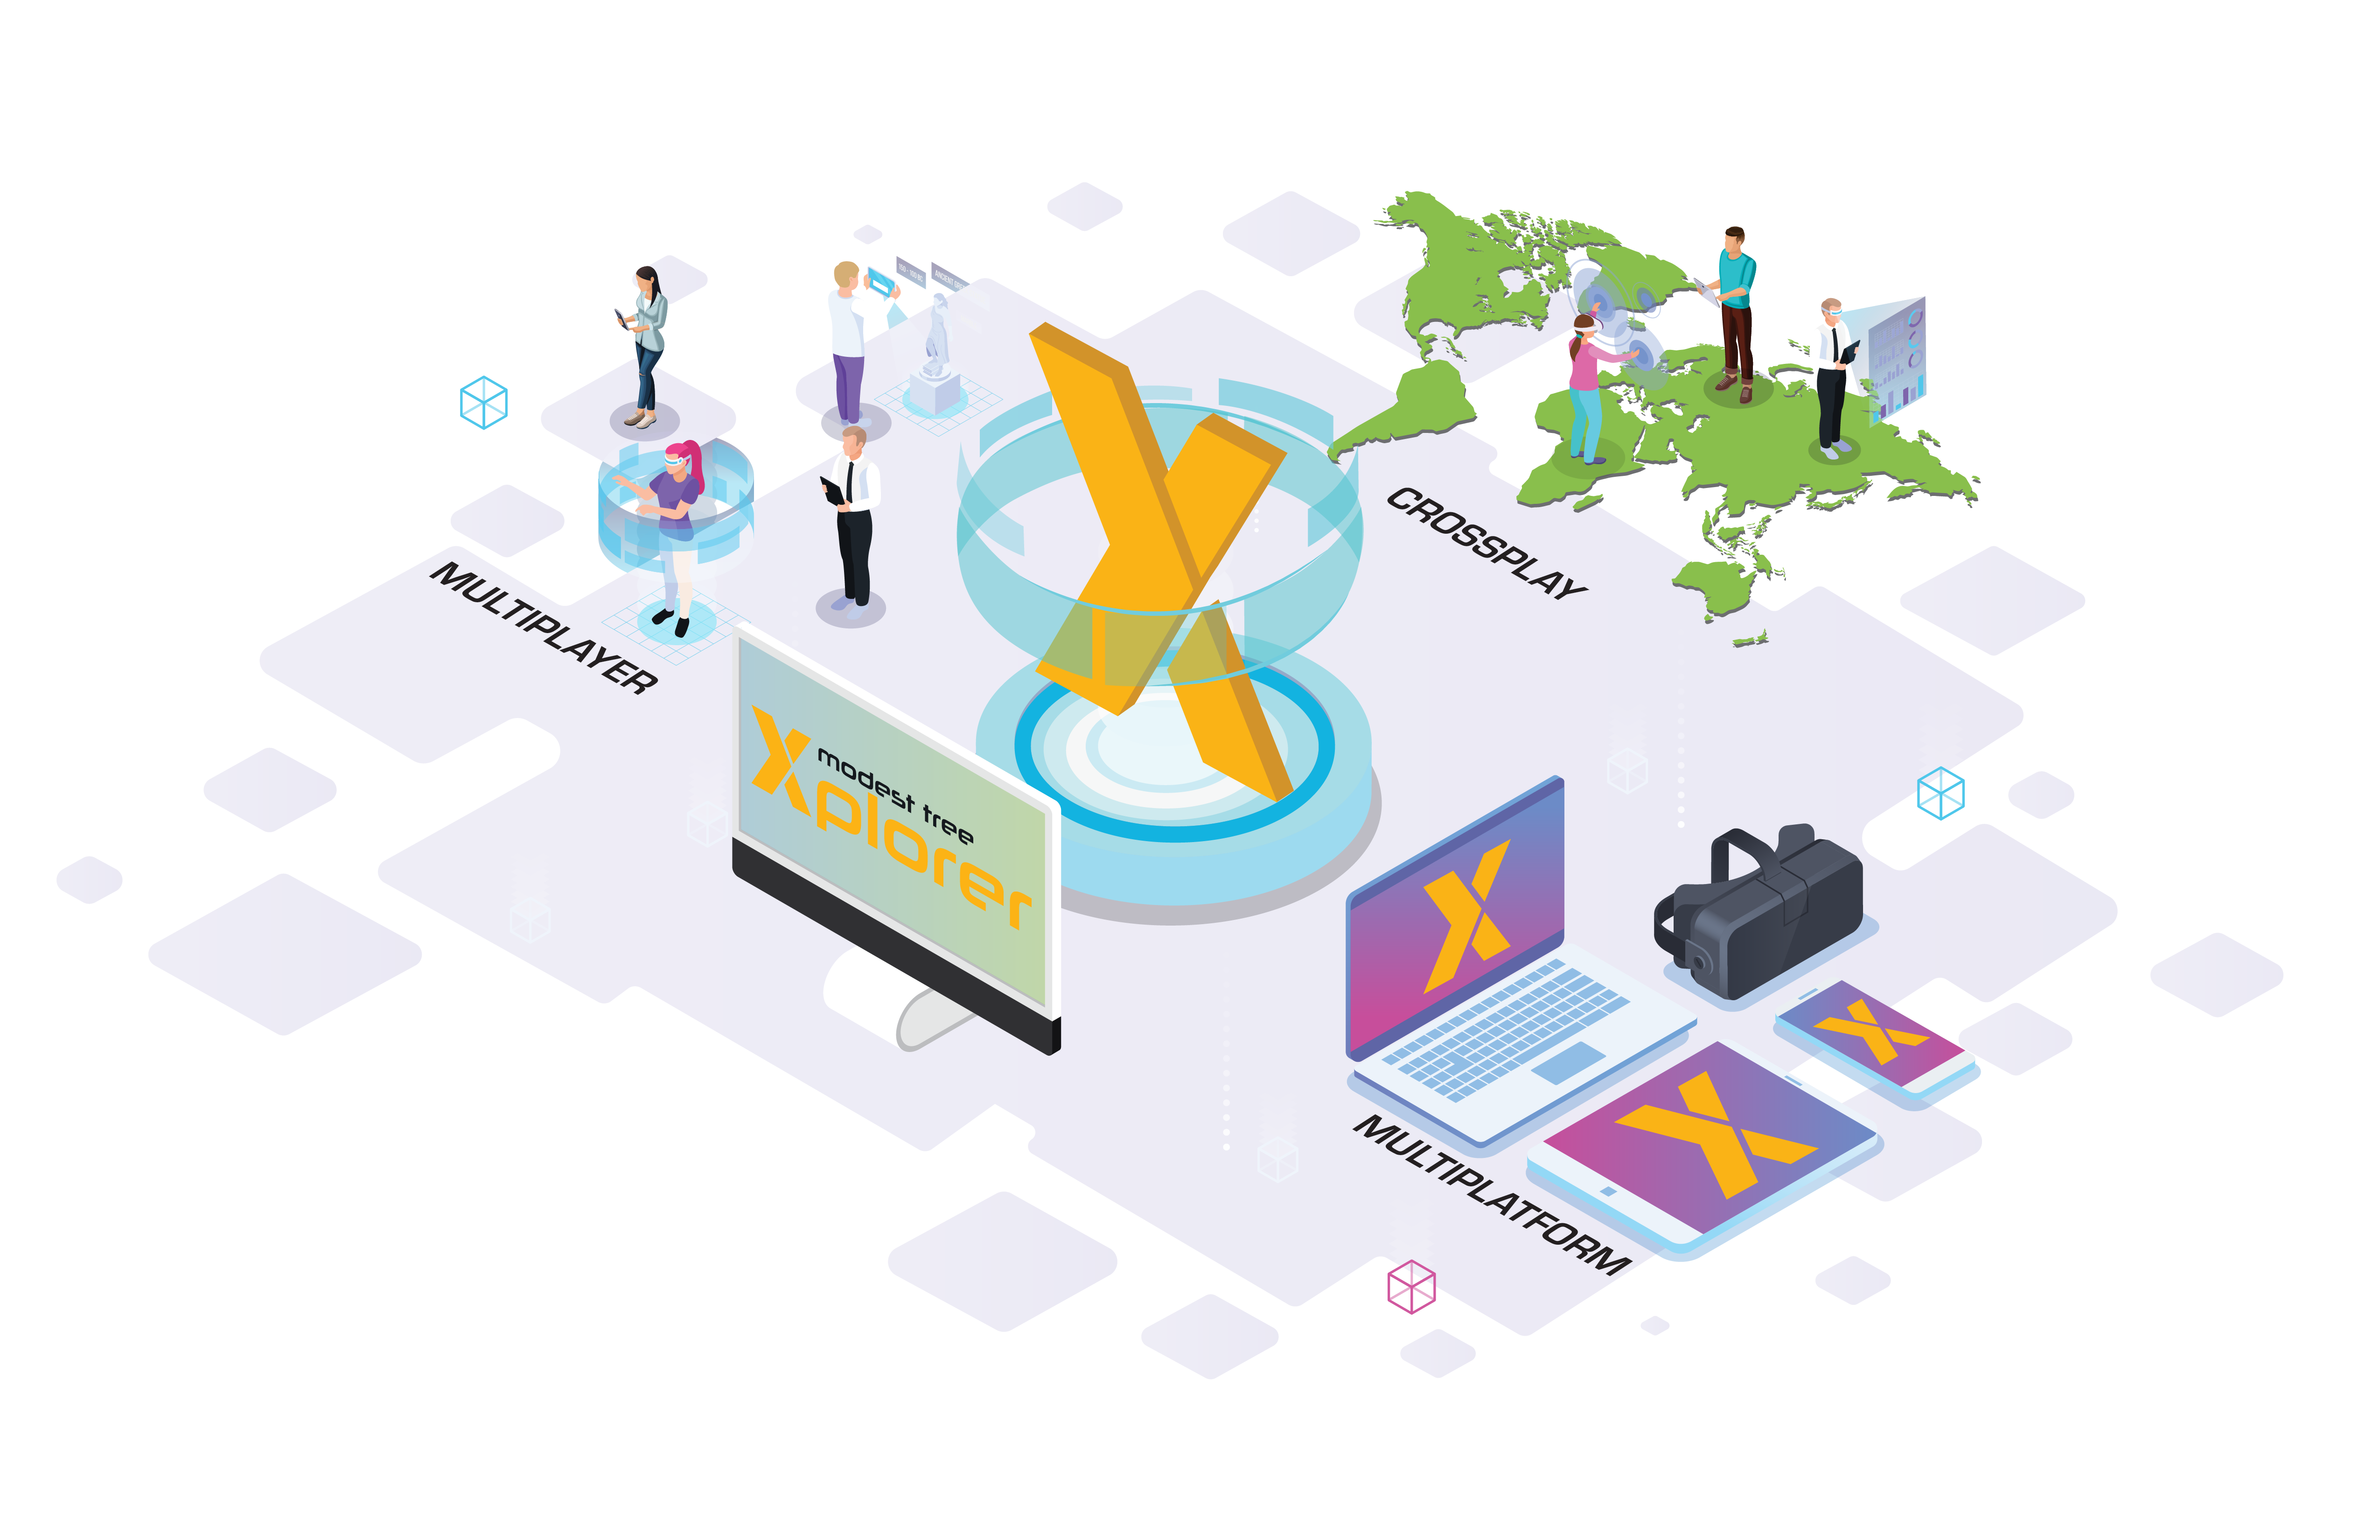 Xplorer features illustrating multiplayer, multiplatform and crossplay